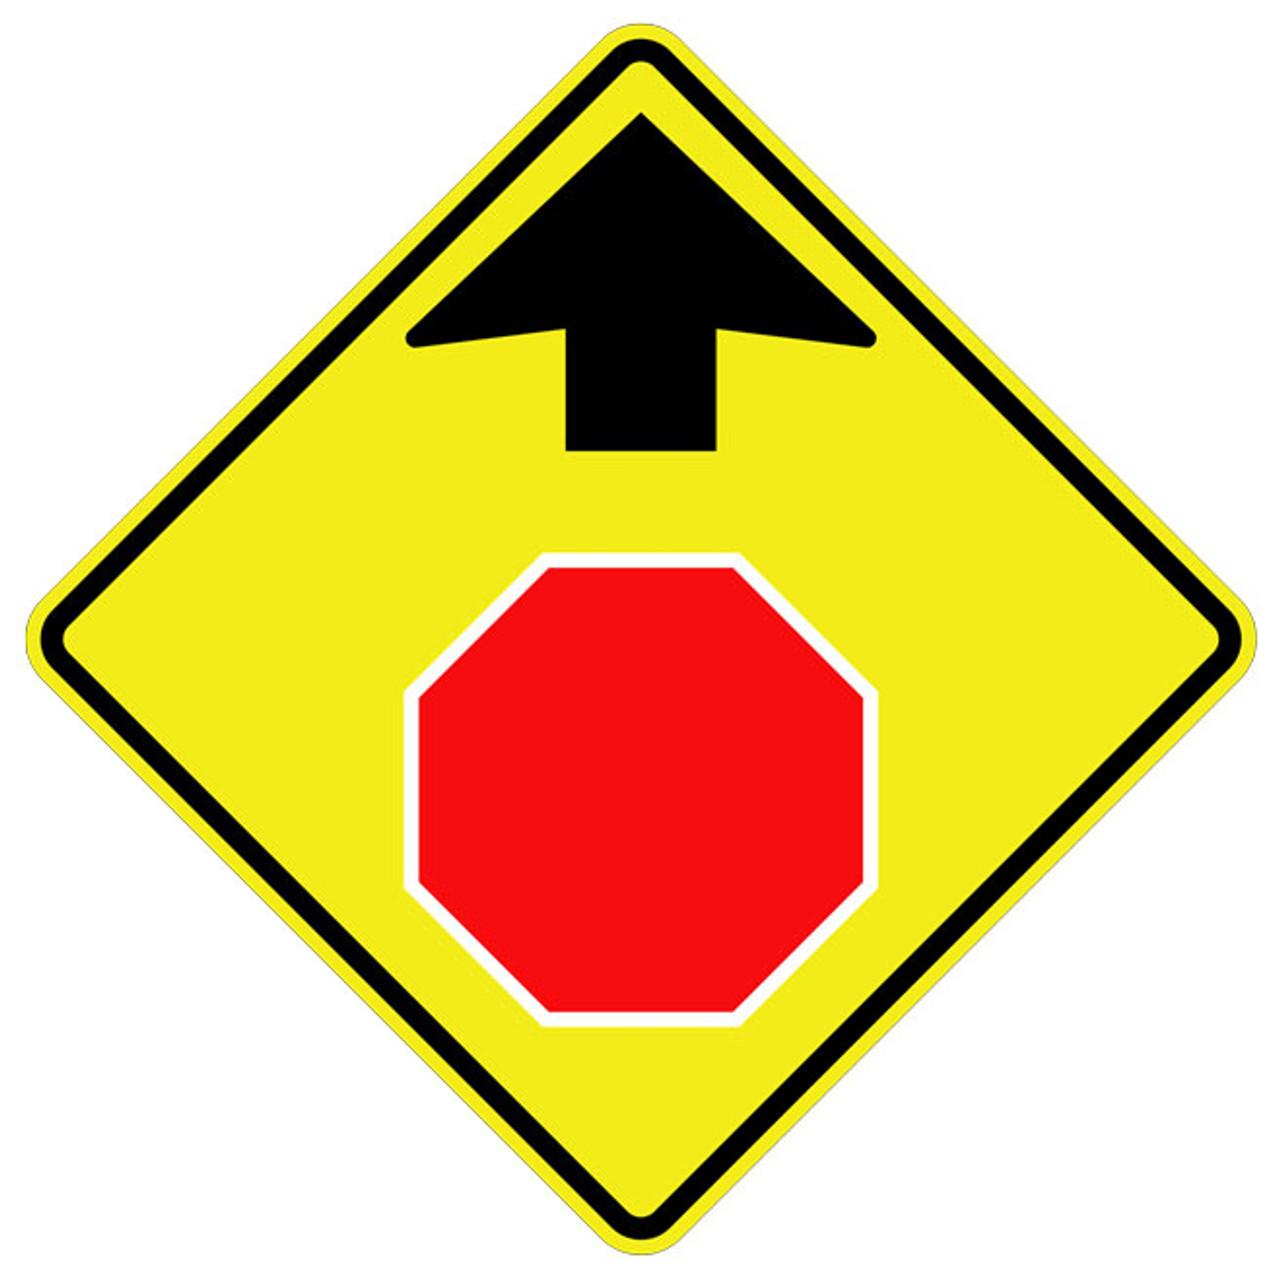 W3-1 Stop Ahead Sym Warning Sign